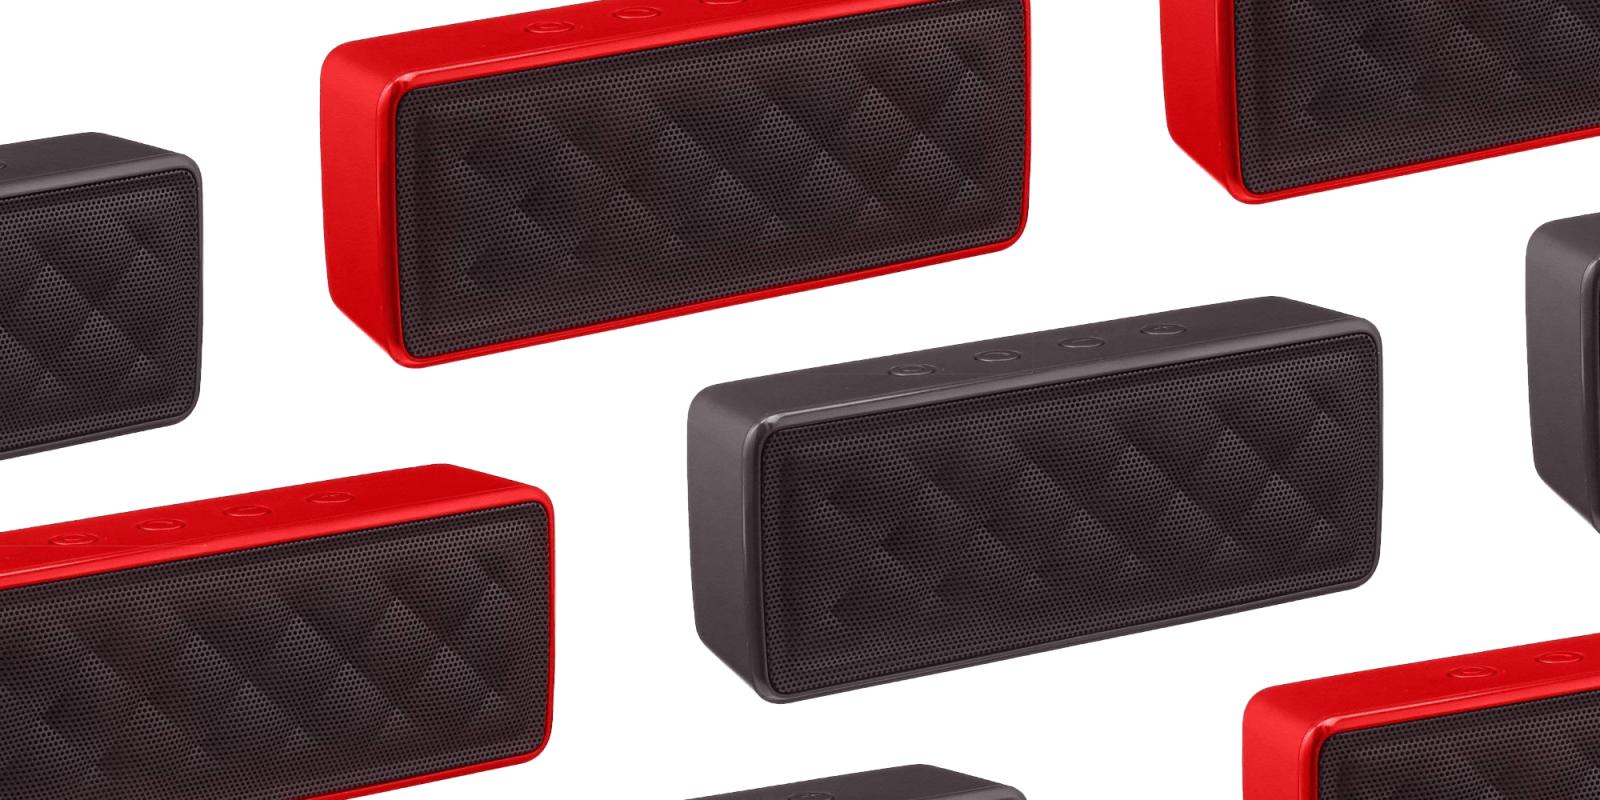 Smartphone Accessories: AmazonBasics Portable Bluetooth Speaker $12 Prime shipped, more